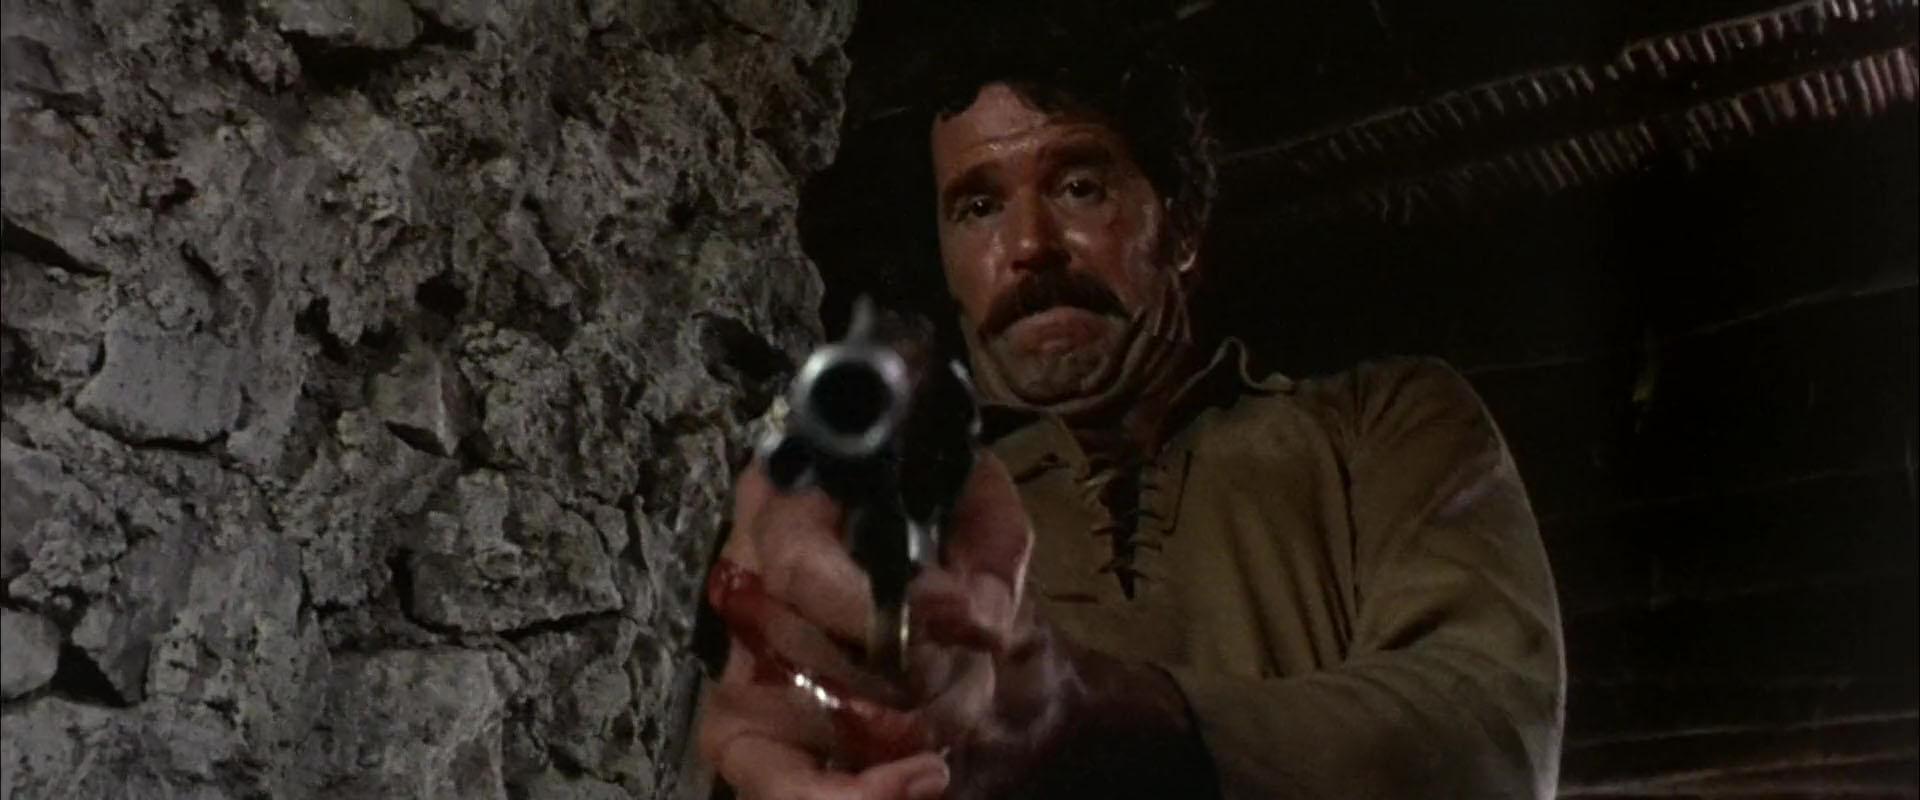 James Garner in A Man Called Sledge (1970)